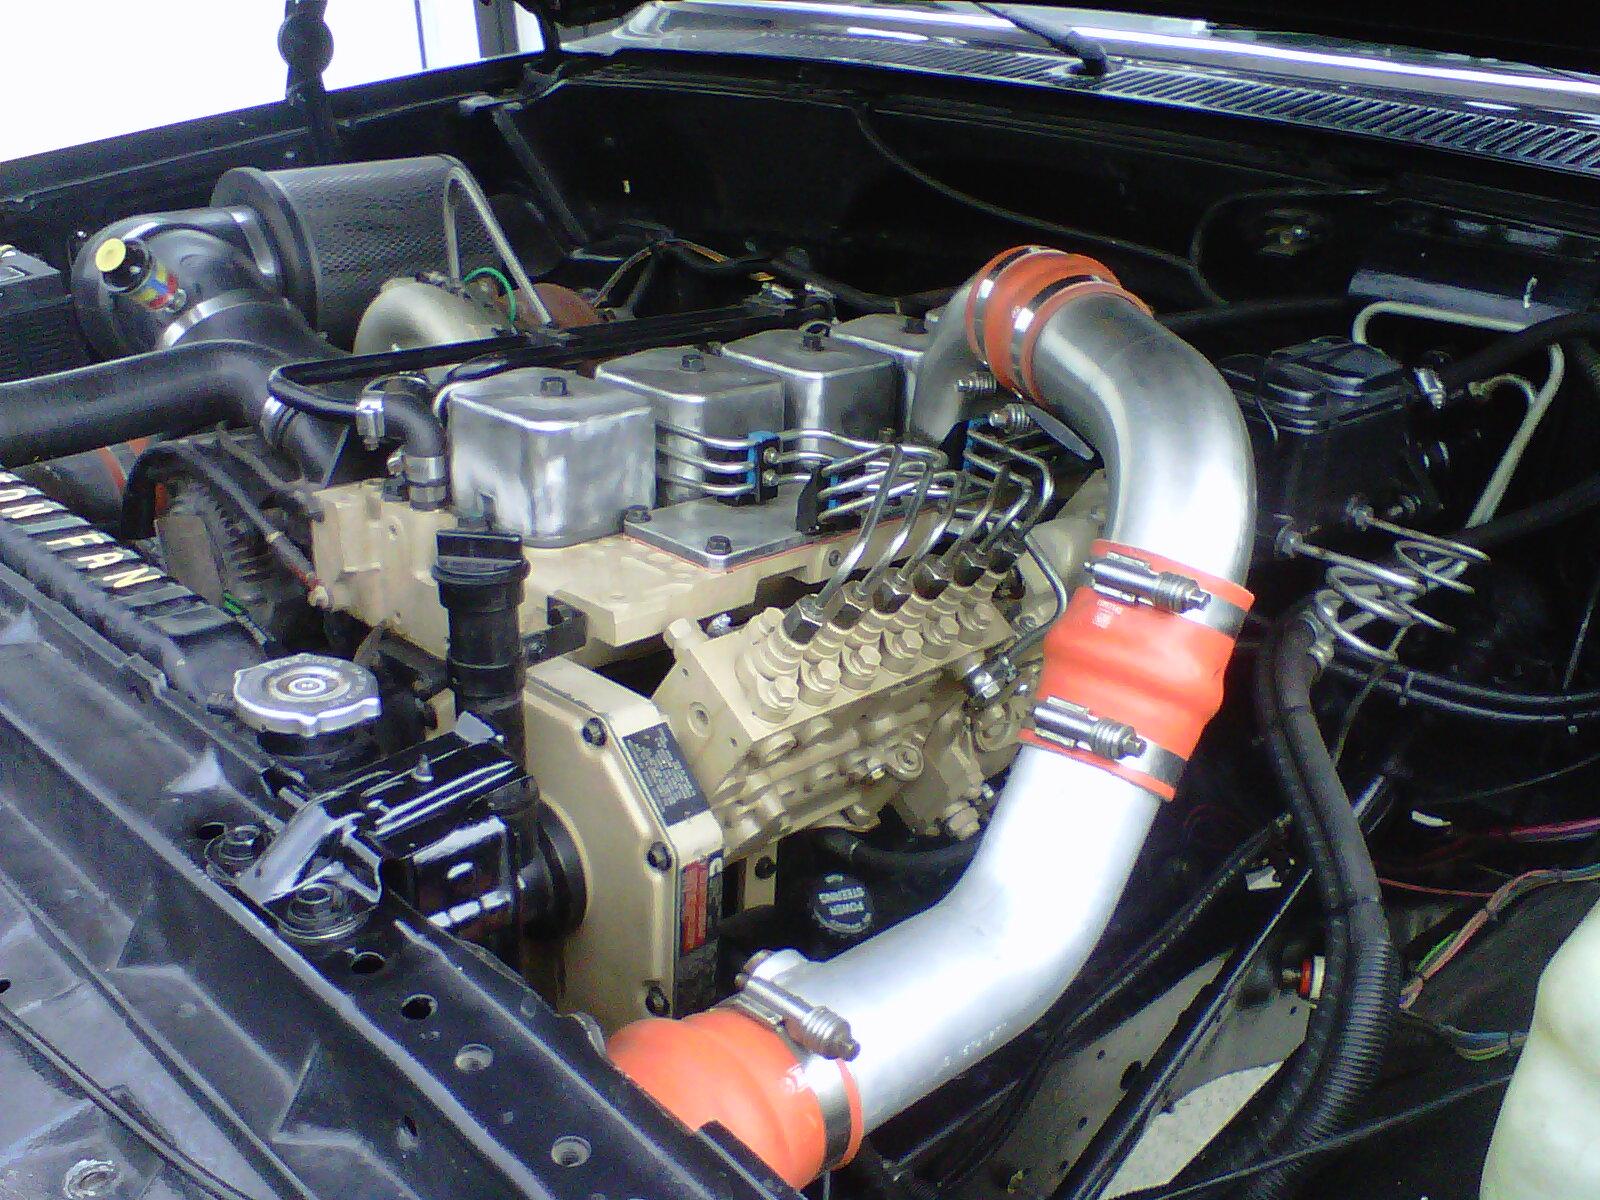 Dodge Cummins Diesel Forum Show Off Your 12 Valves From